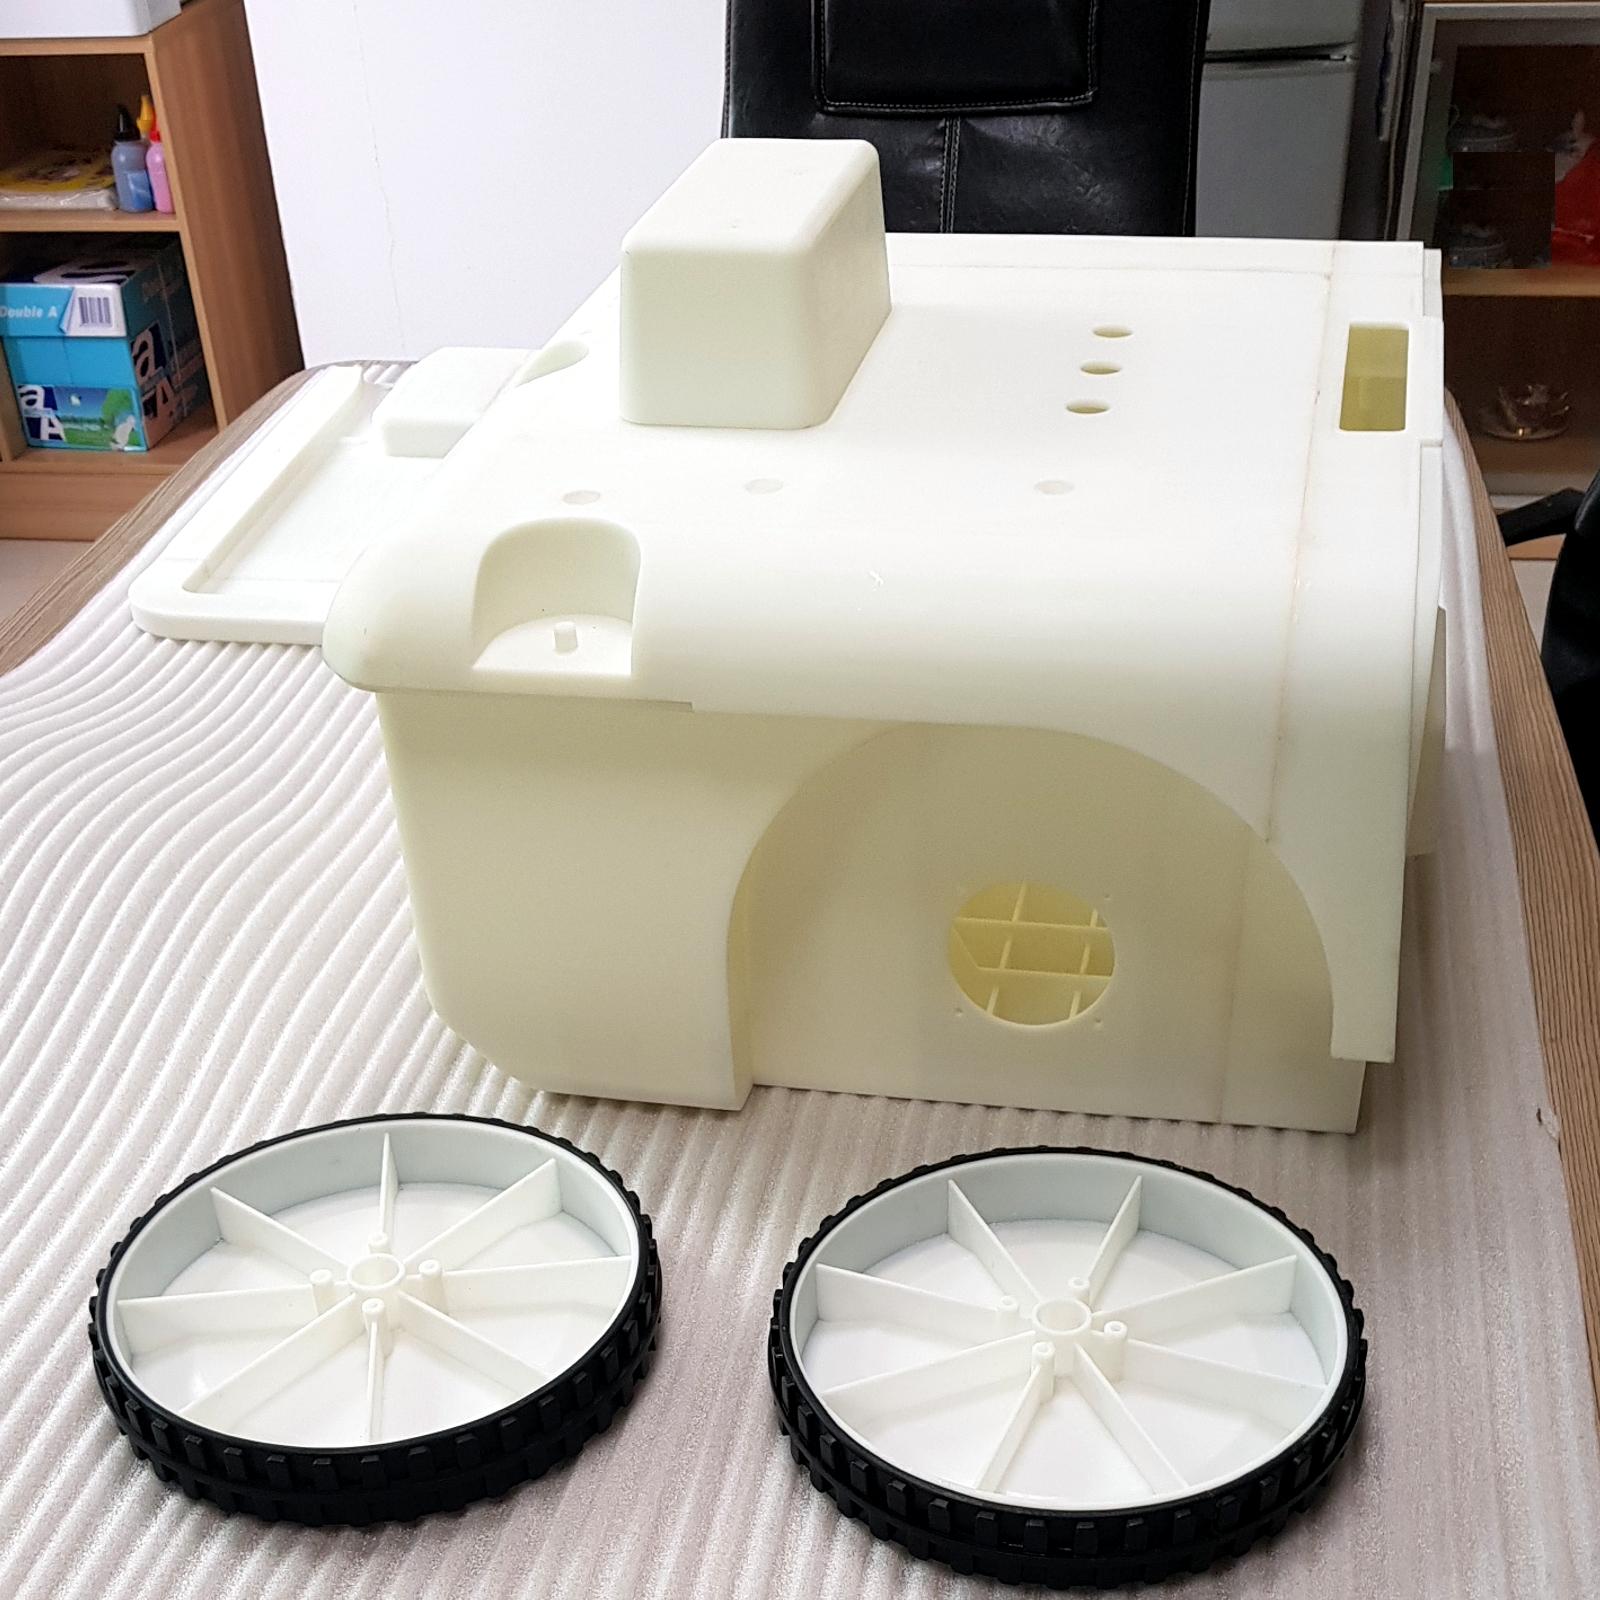 3D printing large size SLA